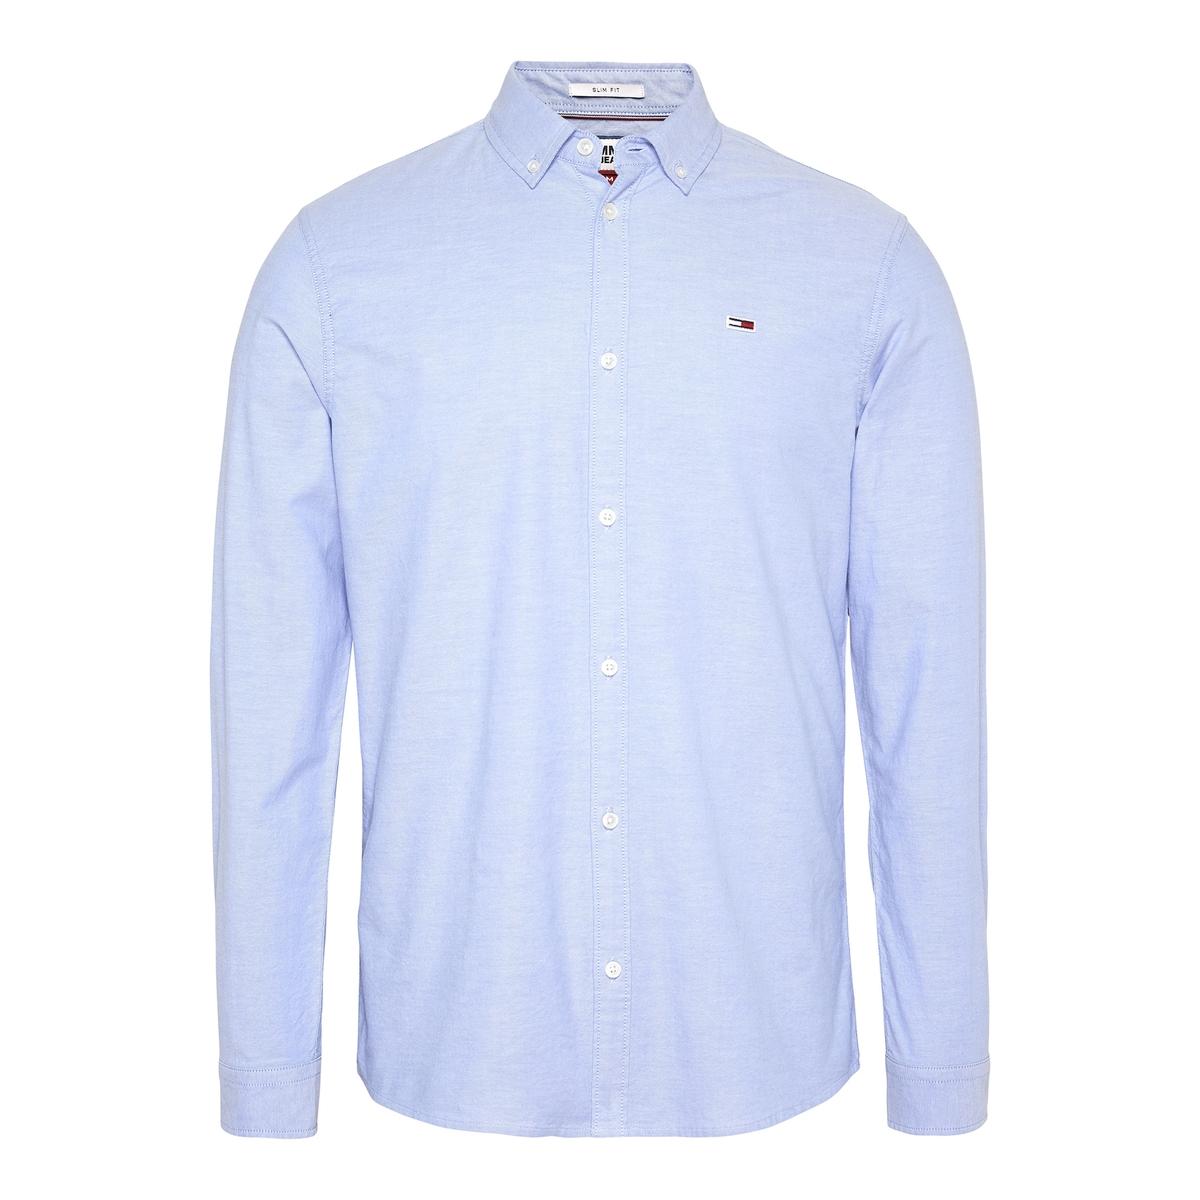 Camisa corte slim stretch, em Oxford